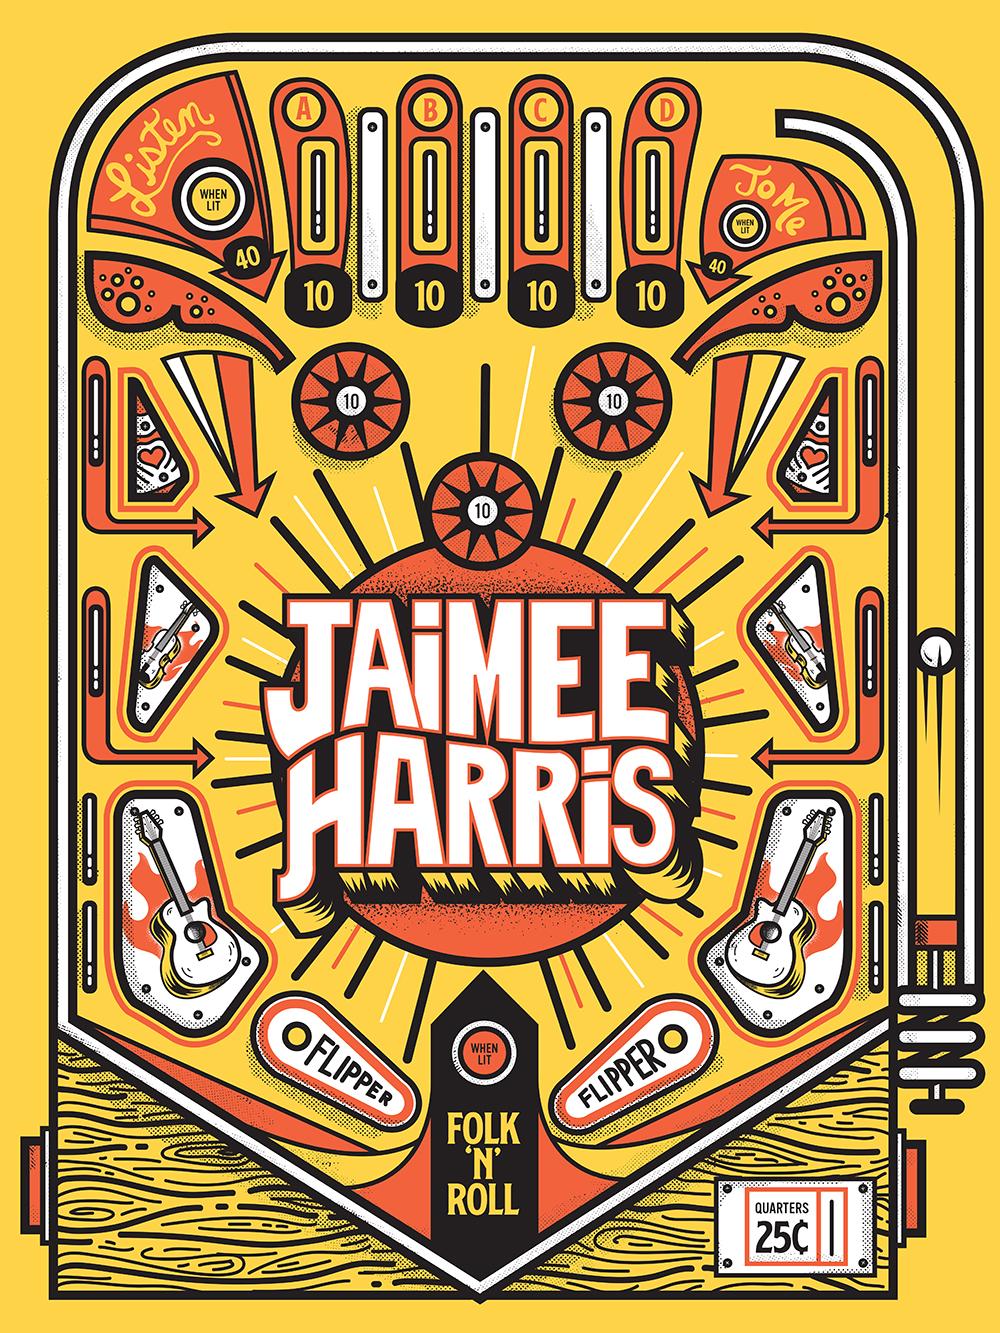 Jaimee Harris Pinball Poster